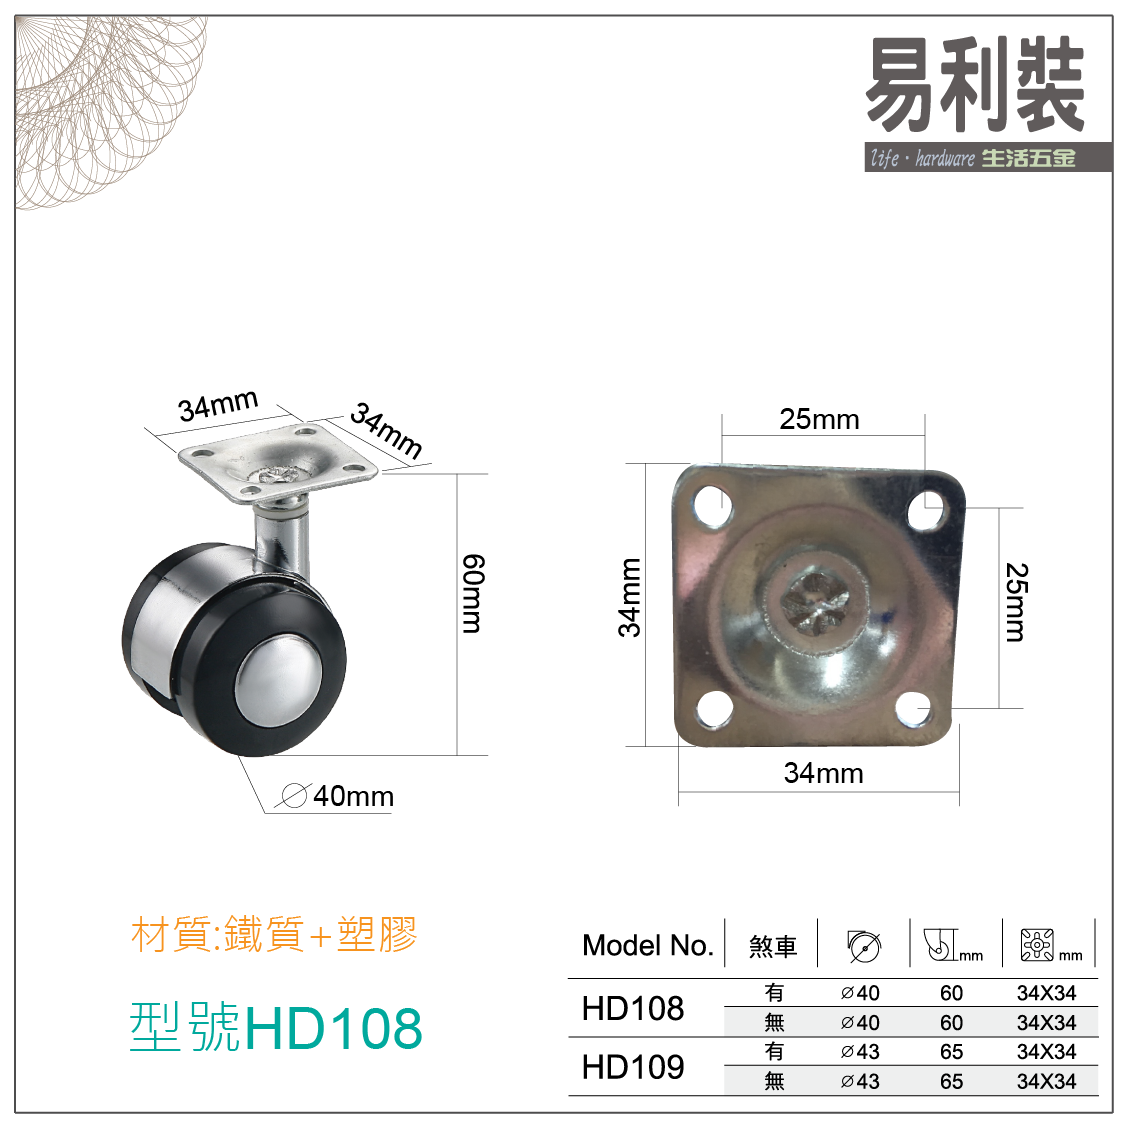 【 EASYCAN  】HD108-109 活動輪 易利裝生活五金 桌輪 櫃輪 房間 臥房 衣櫃 小資族 辦公家具 系統家具 2